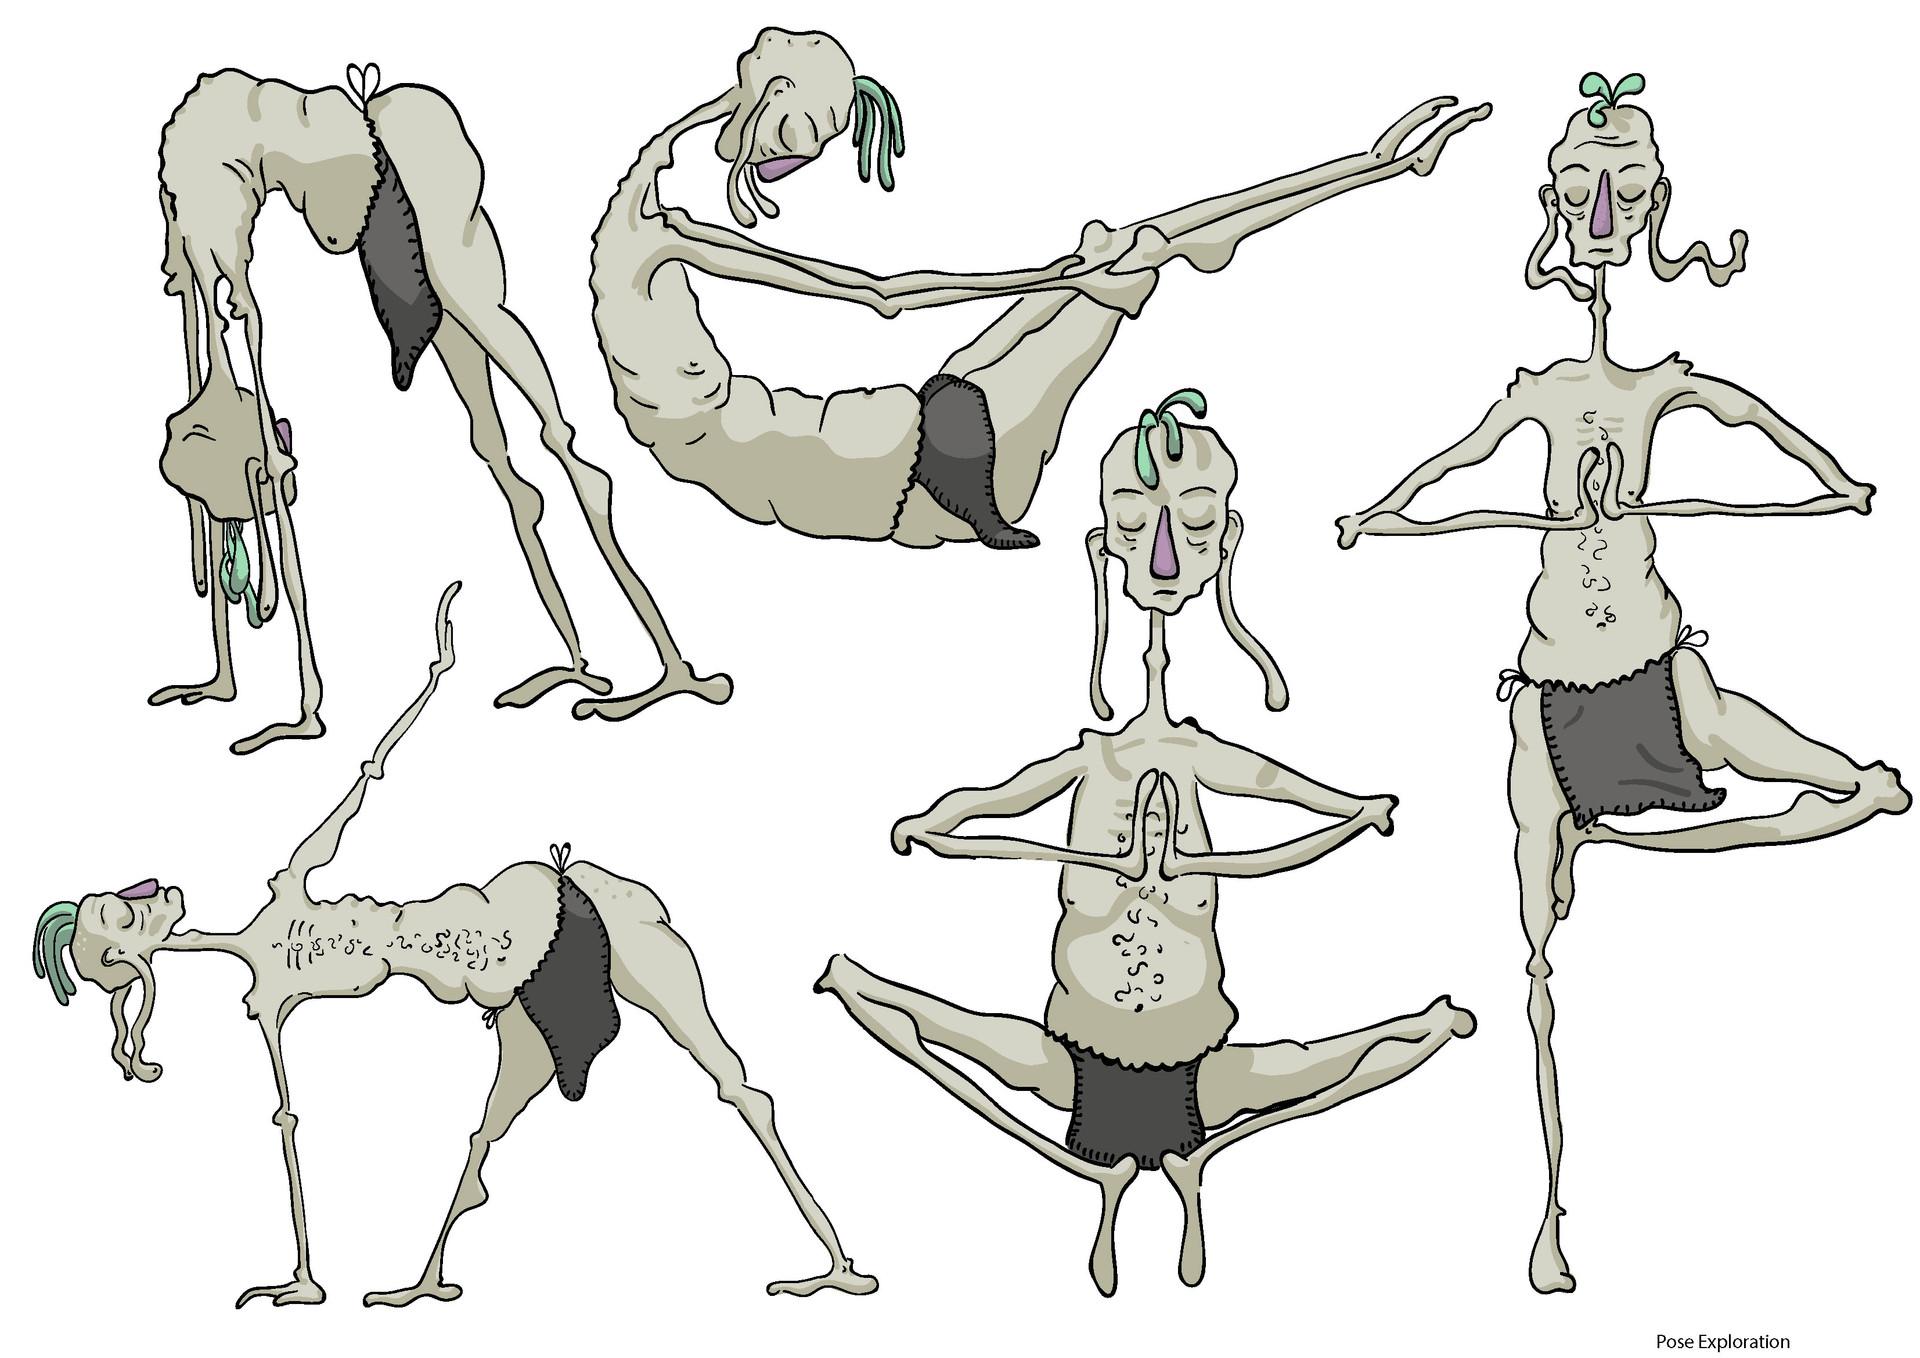 Model Sheet - Poses